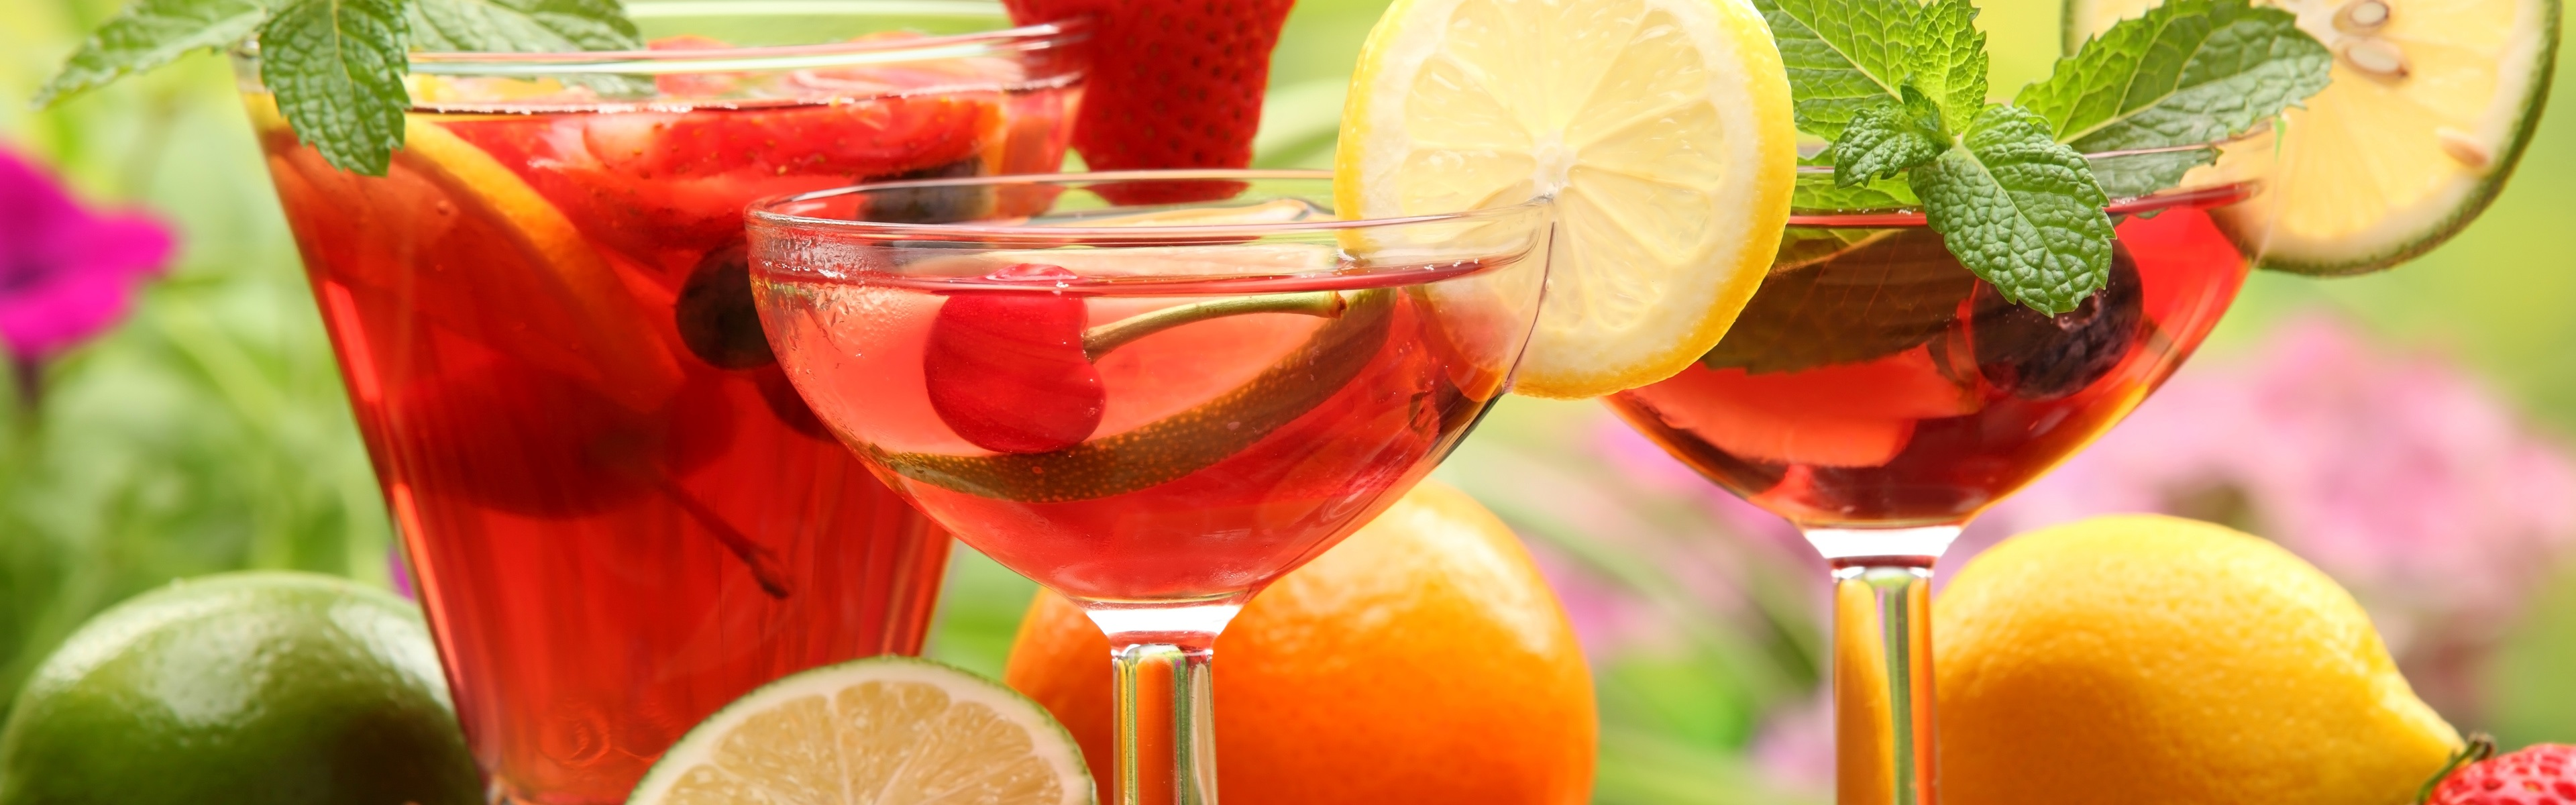 еда напитки лайм лимон апельсин клубника вишня коктейль food drinks lime lemon orange strawberry cherry cocktail  № 2154619  скачать